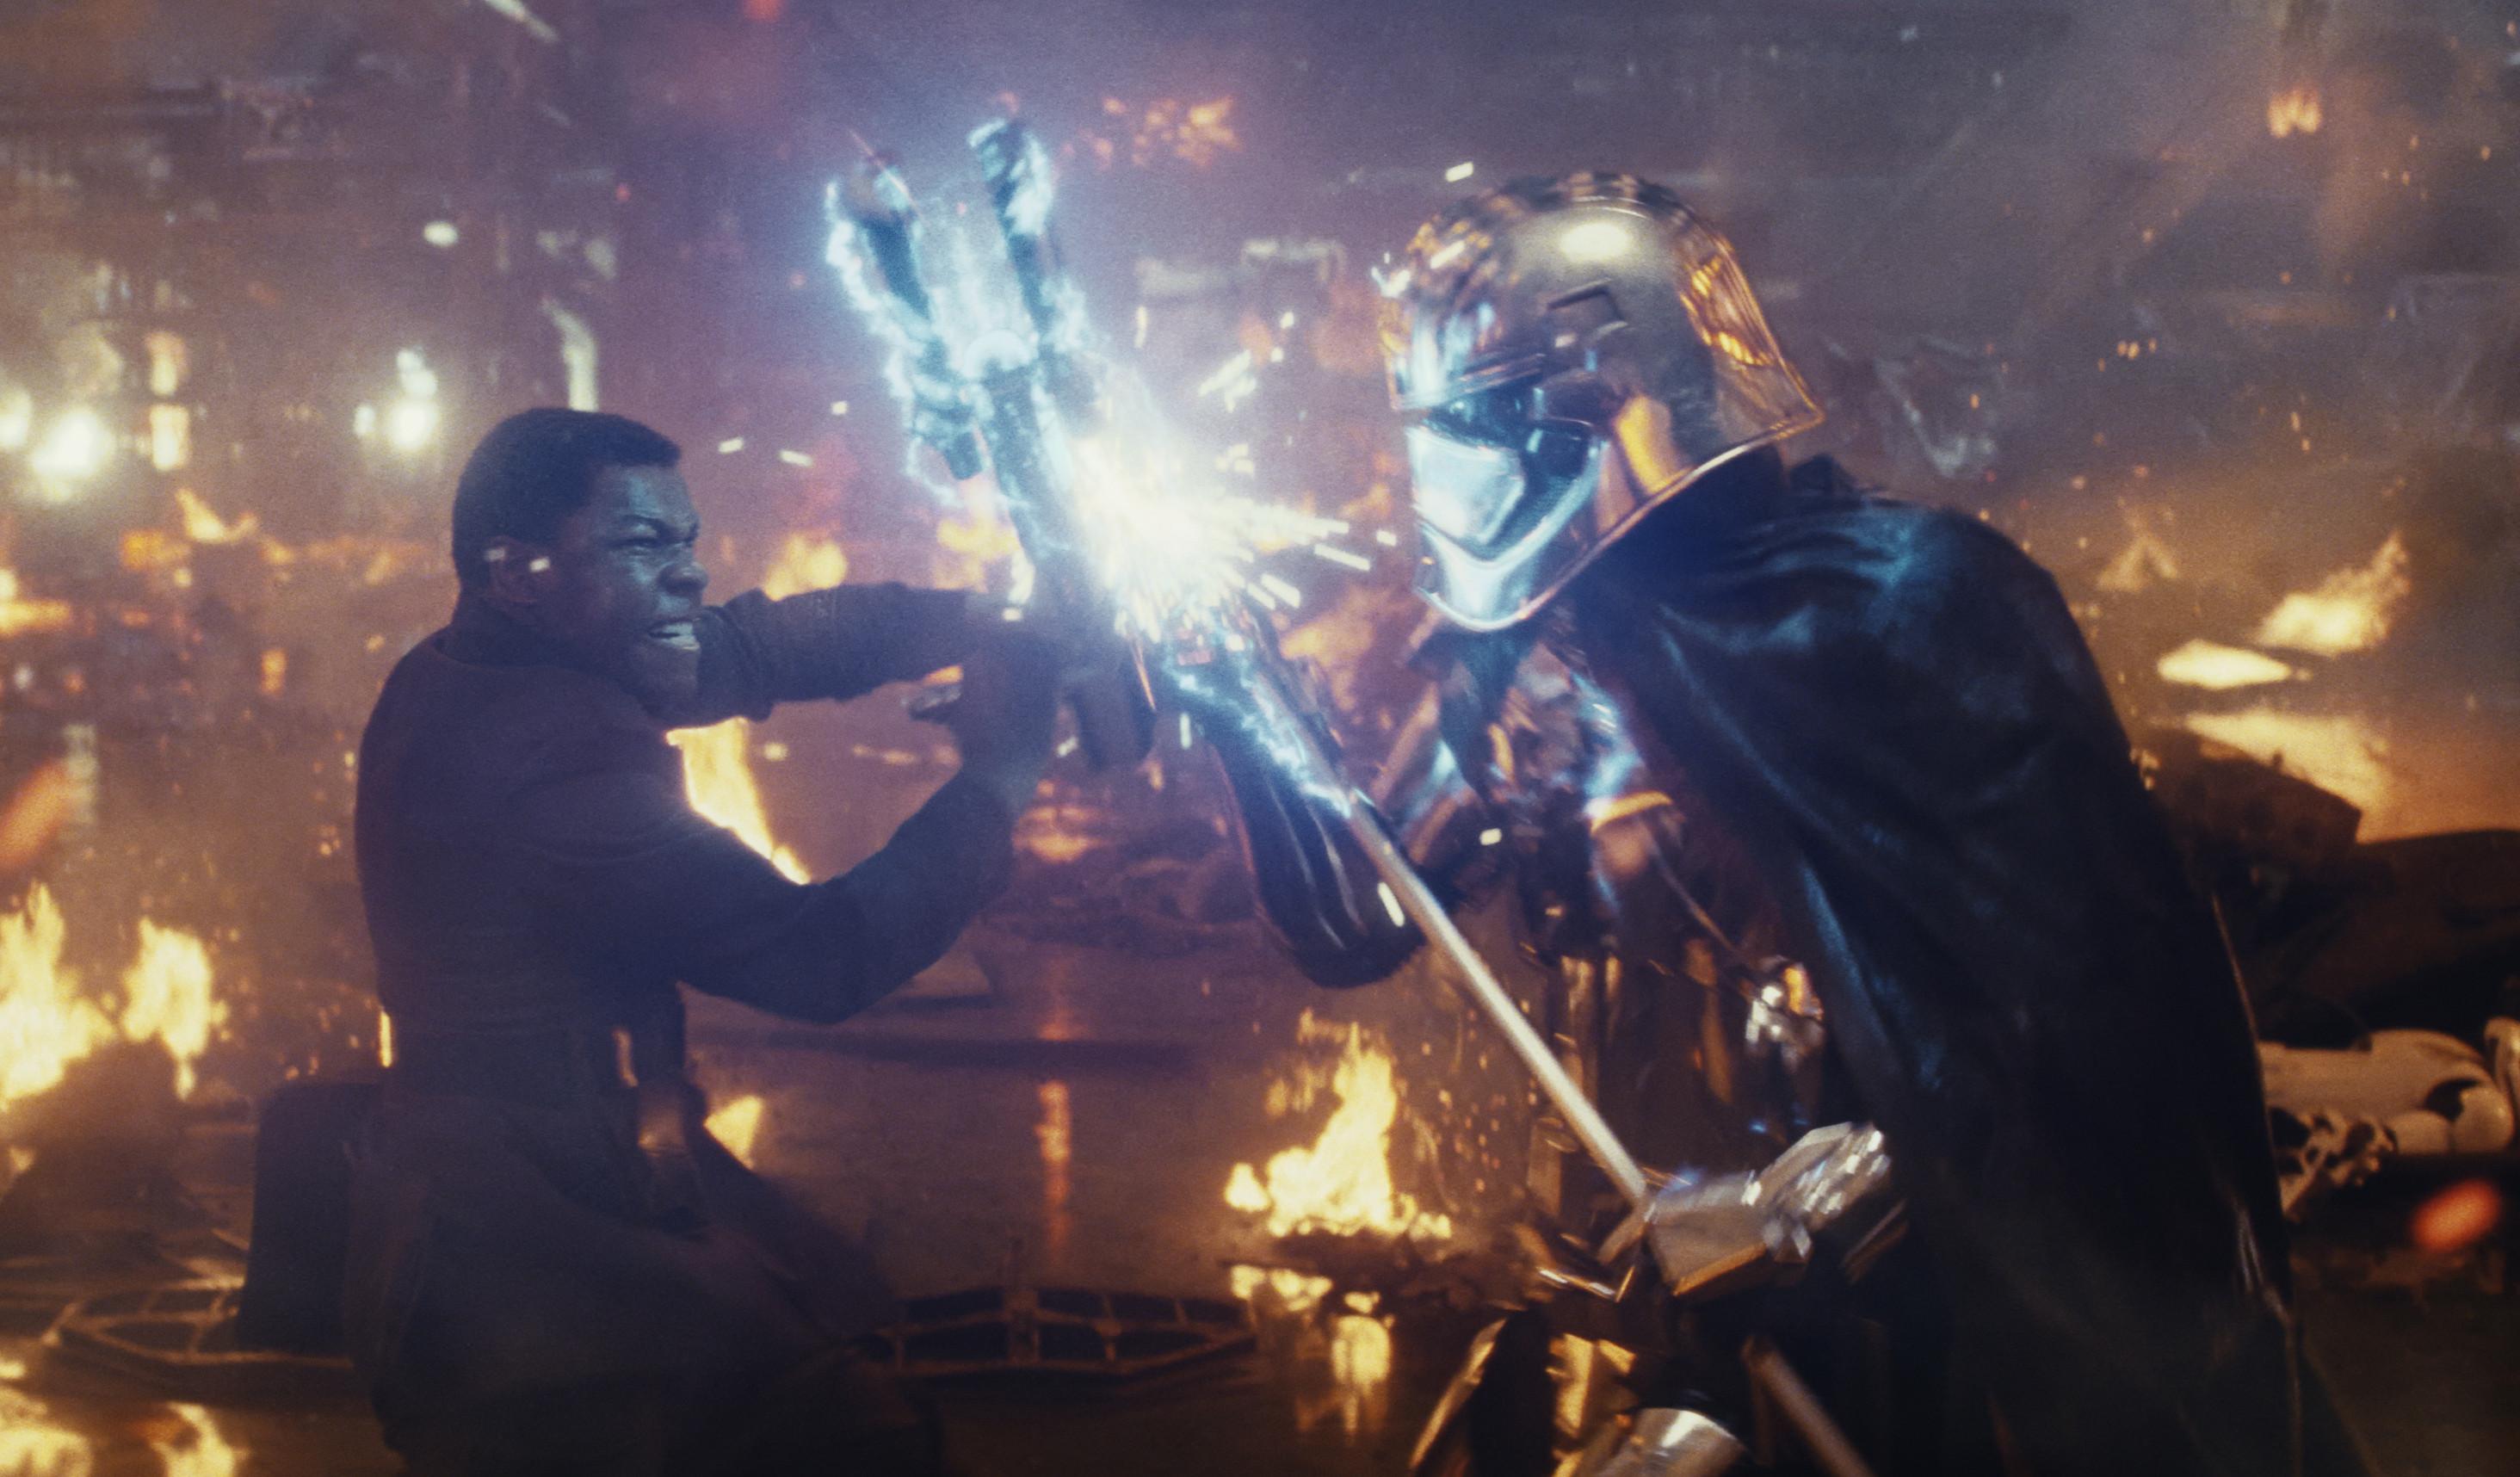 Star Wars, The Last Jedi, John Boyega